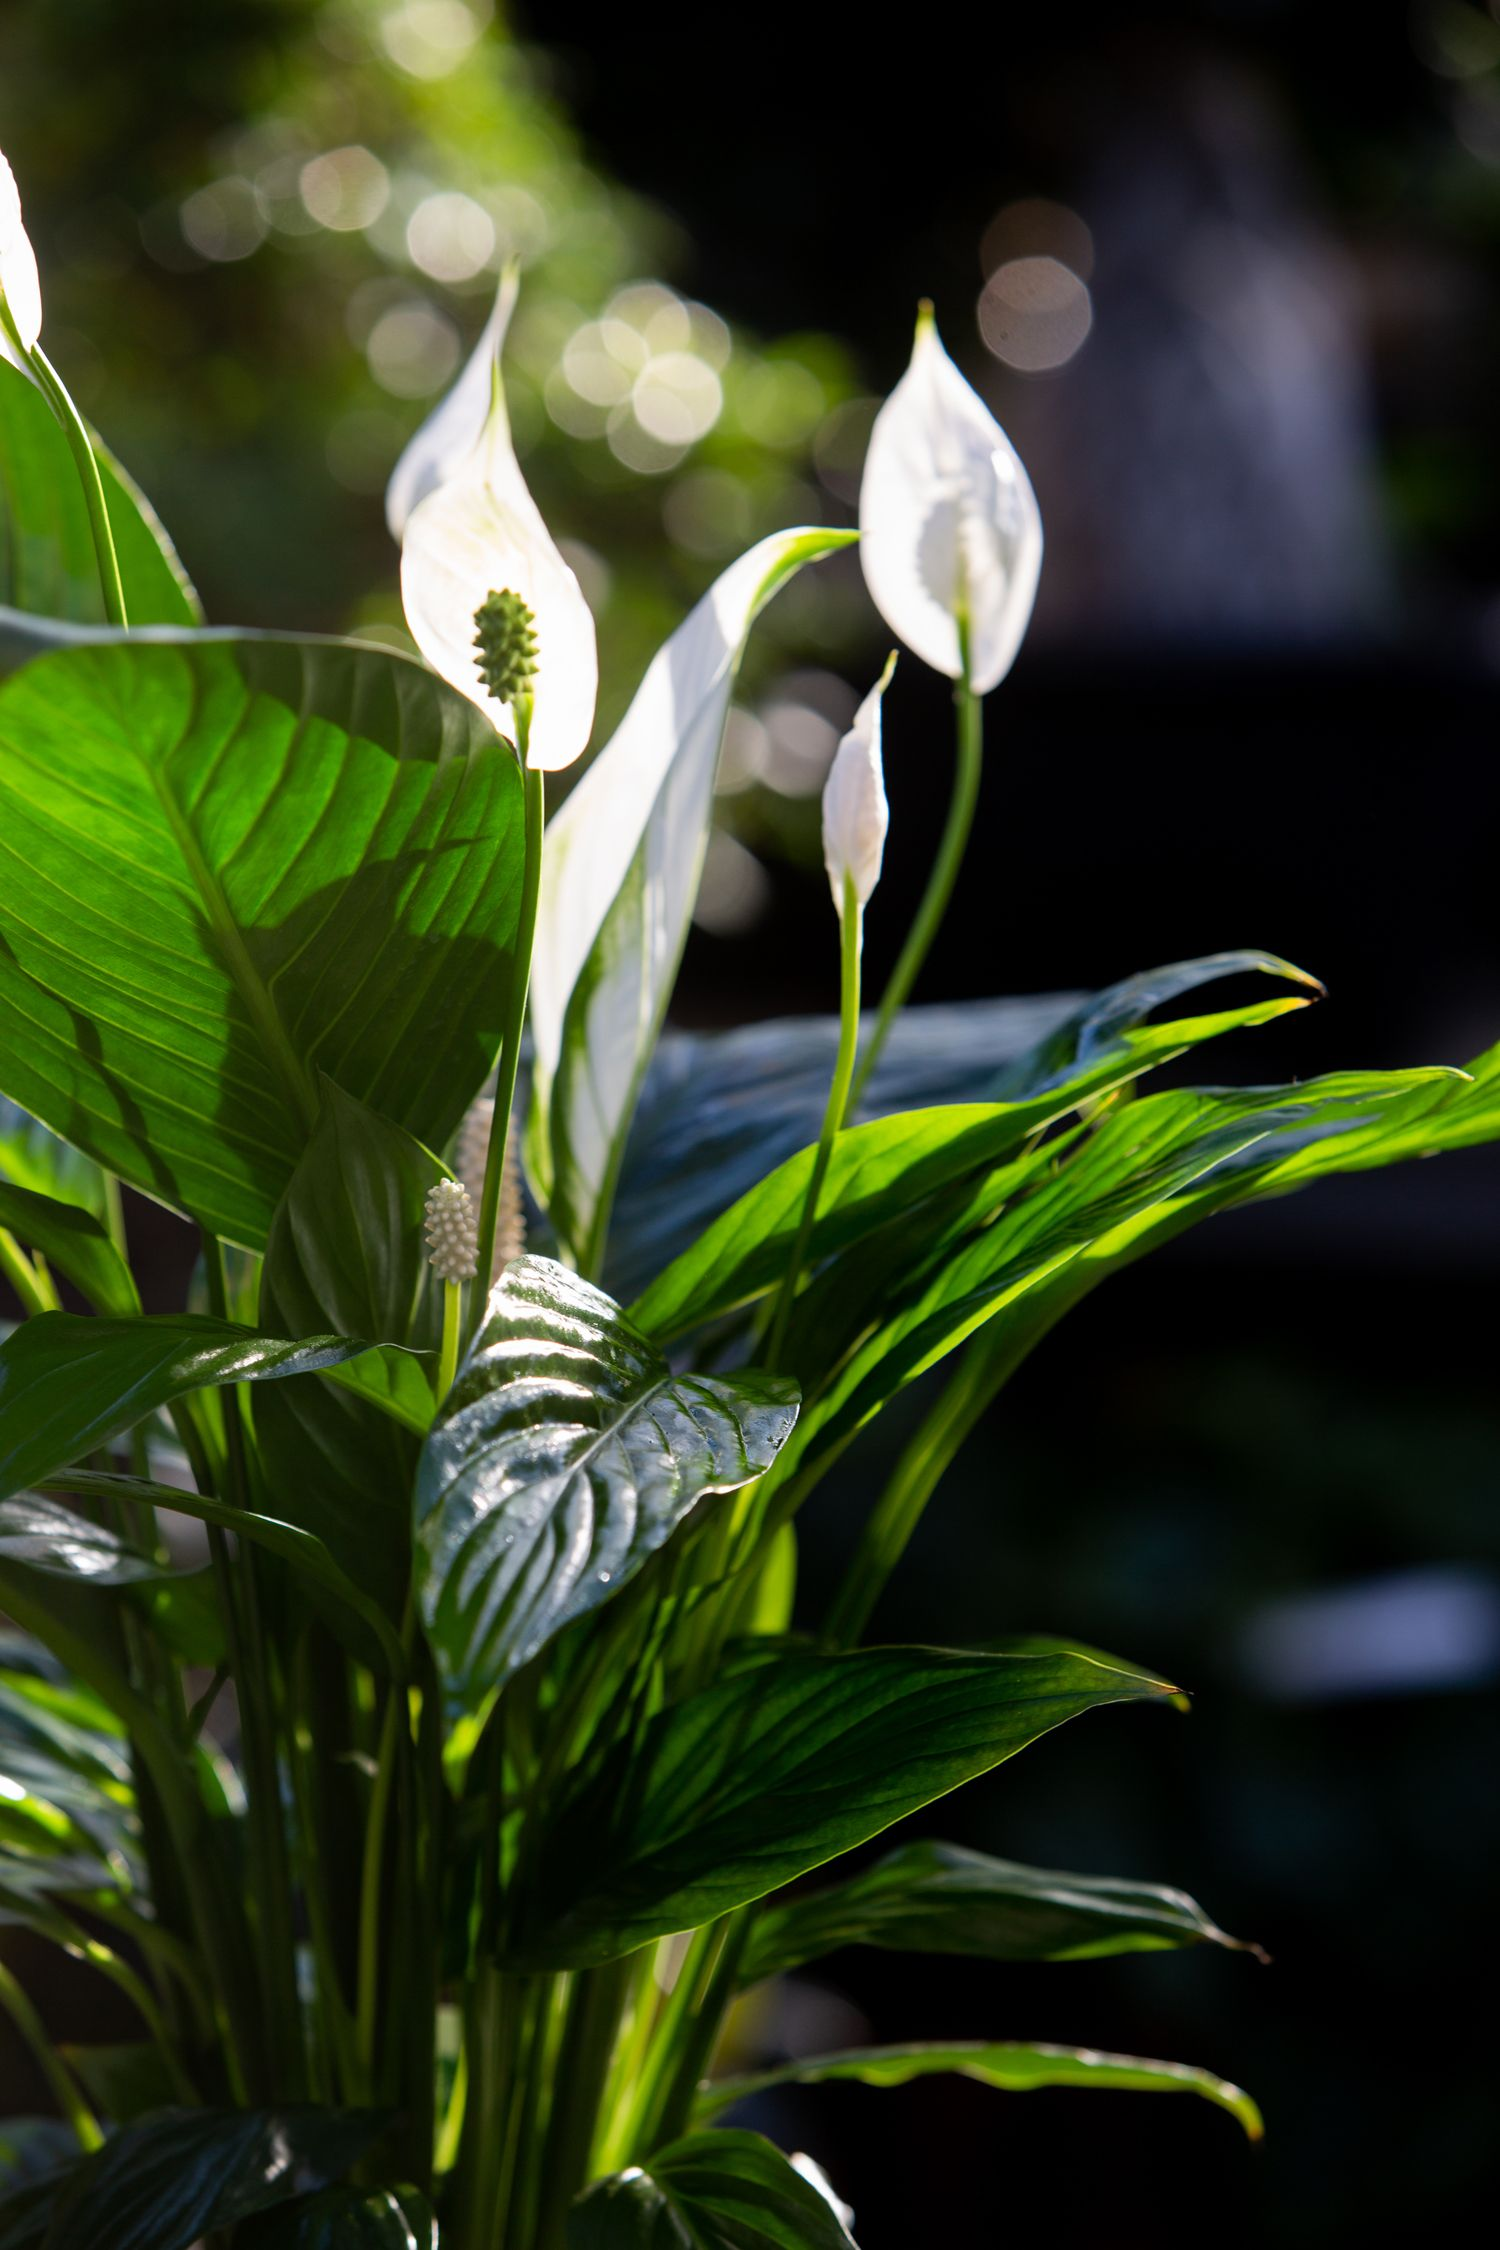 plante fleur blanche fleurs blanches